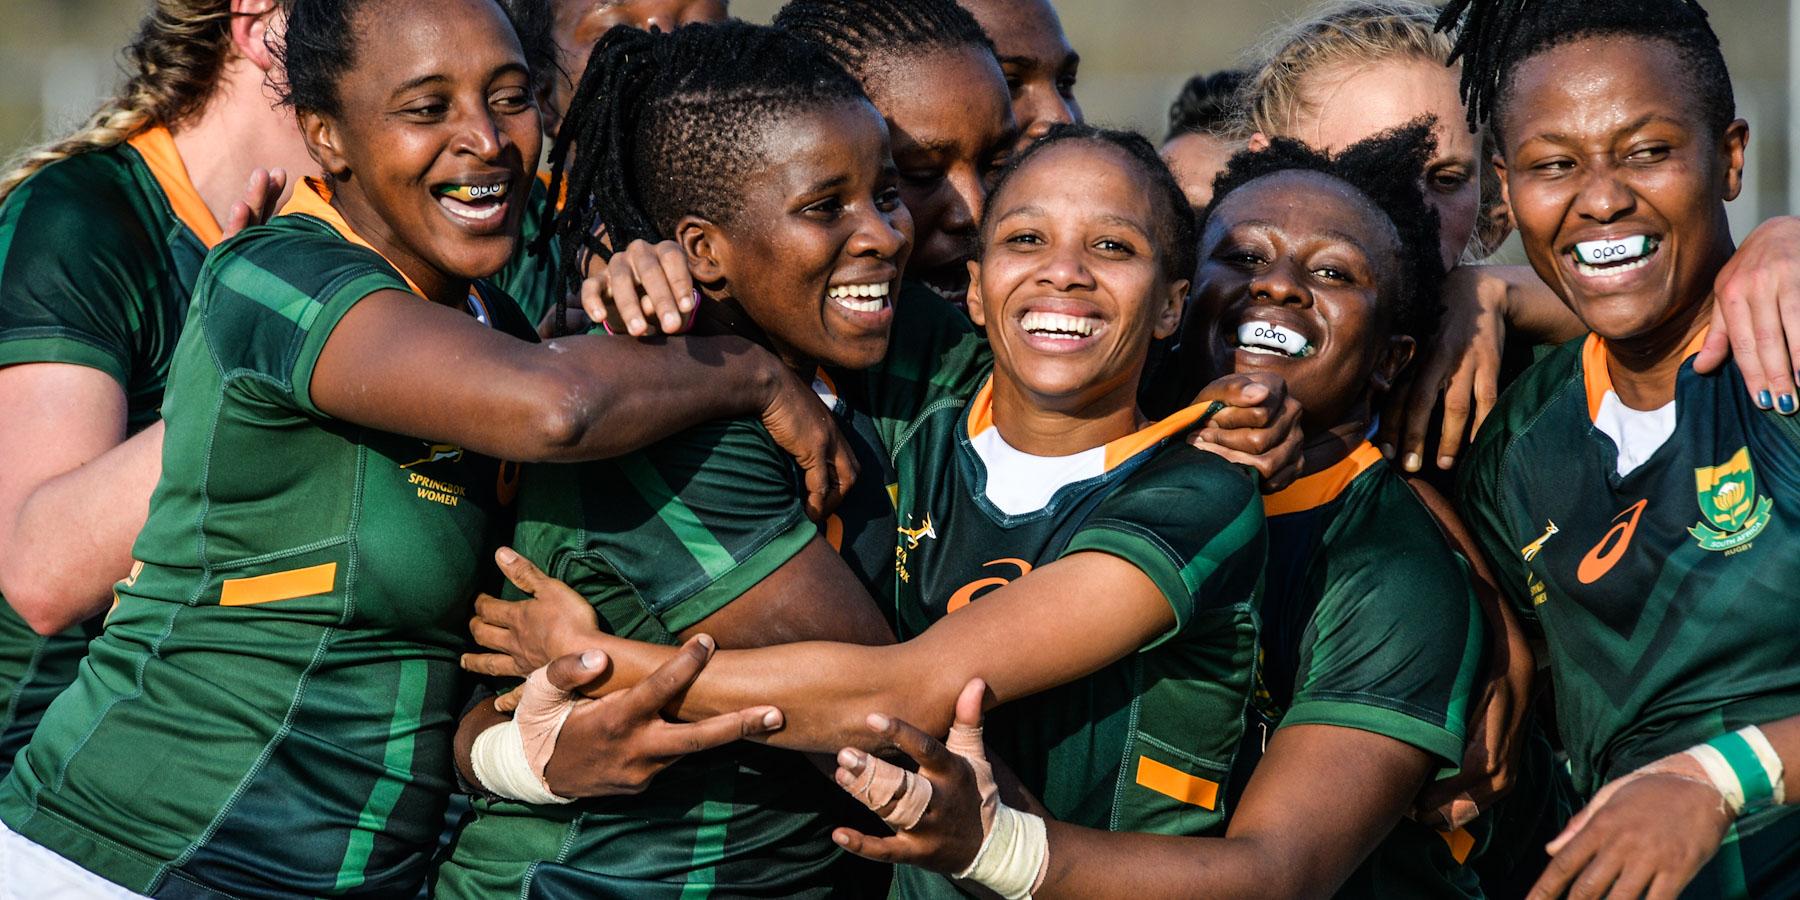 South Africa beats Kenya twice